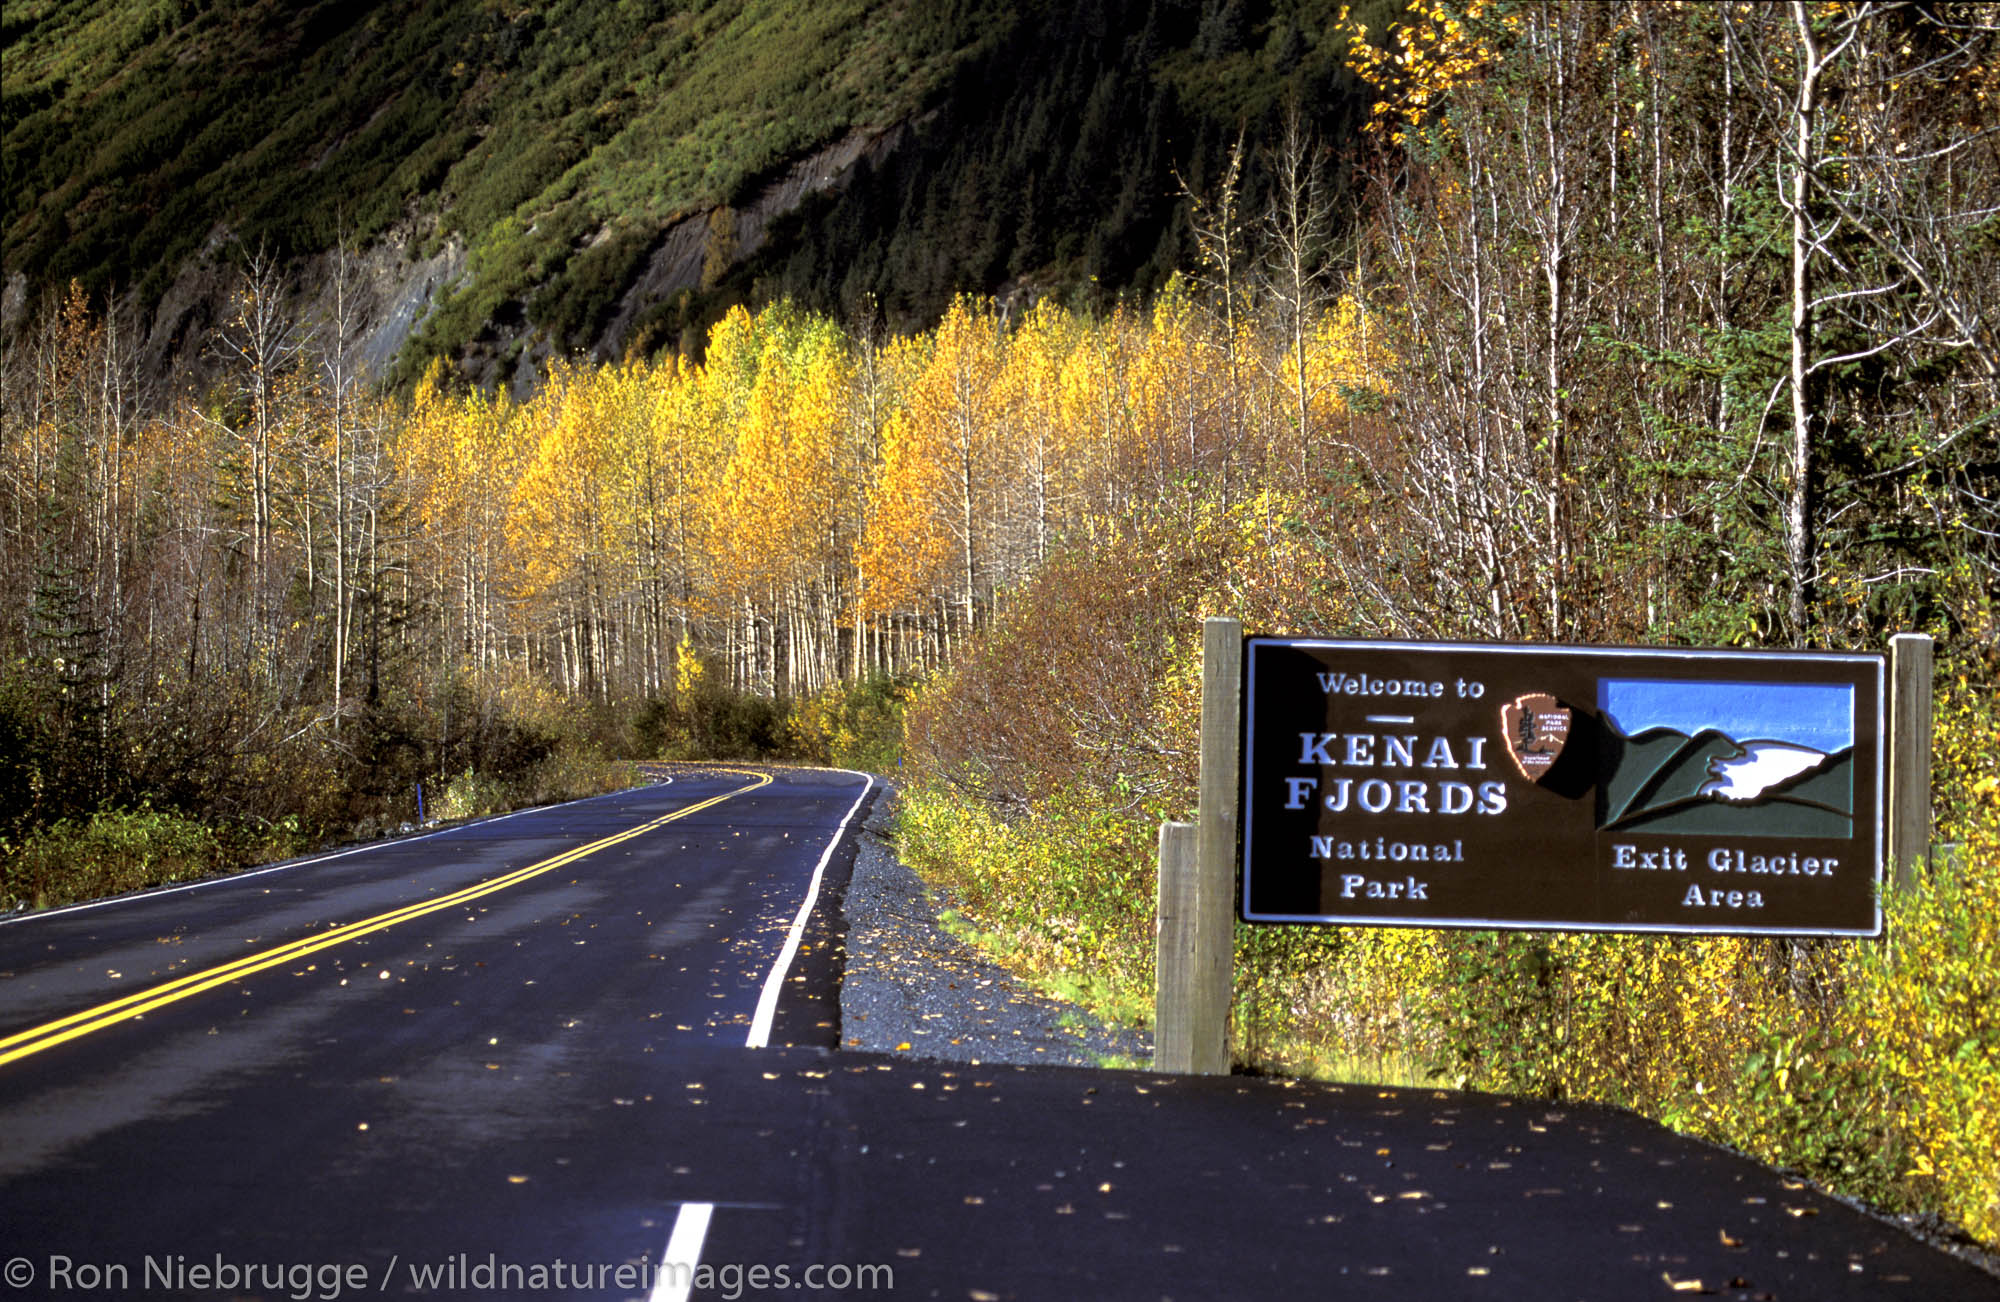 Kenai Fjords National Park Welcome Sign.  Kenai Fjords National Park, Alaska.